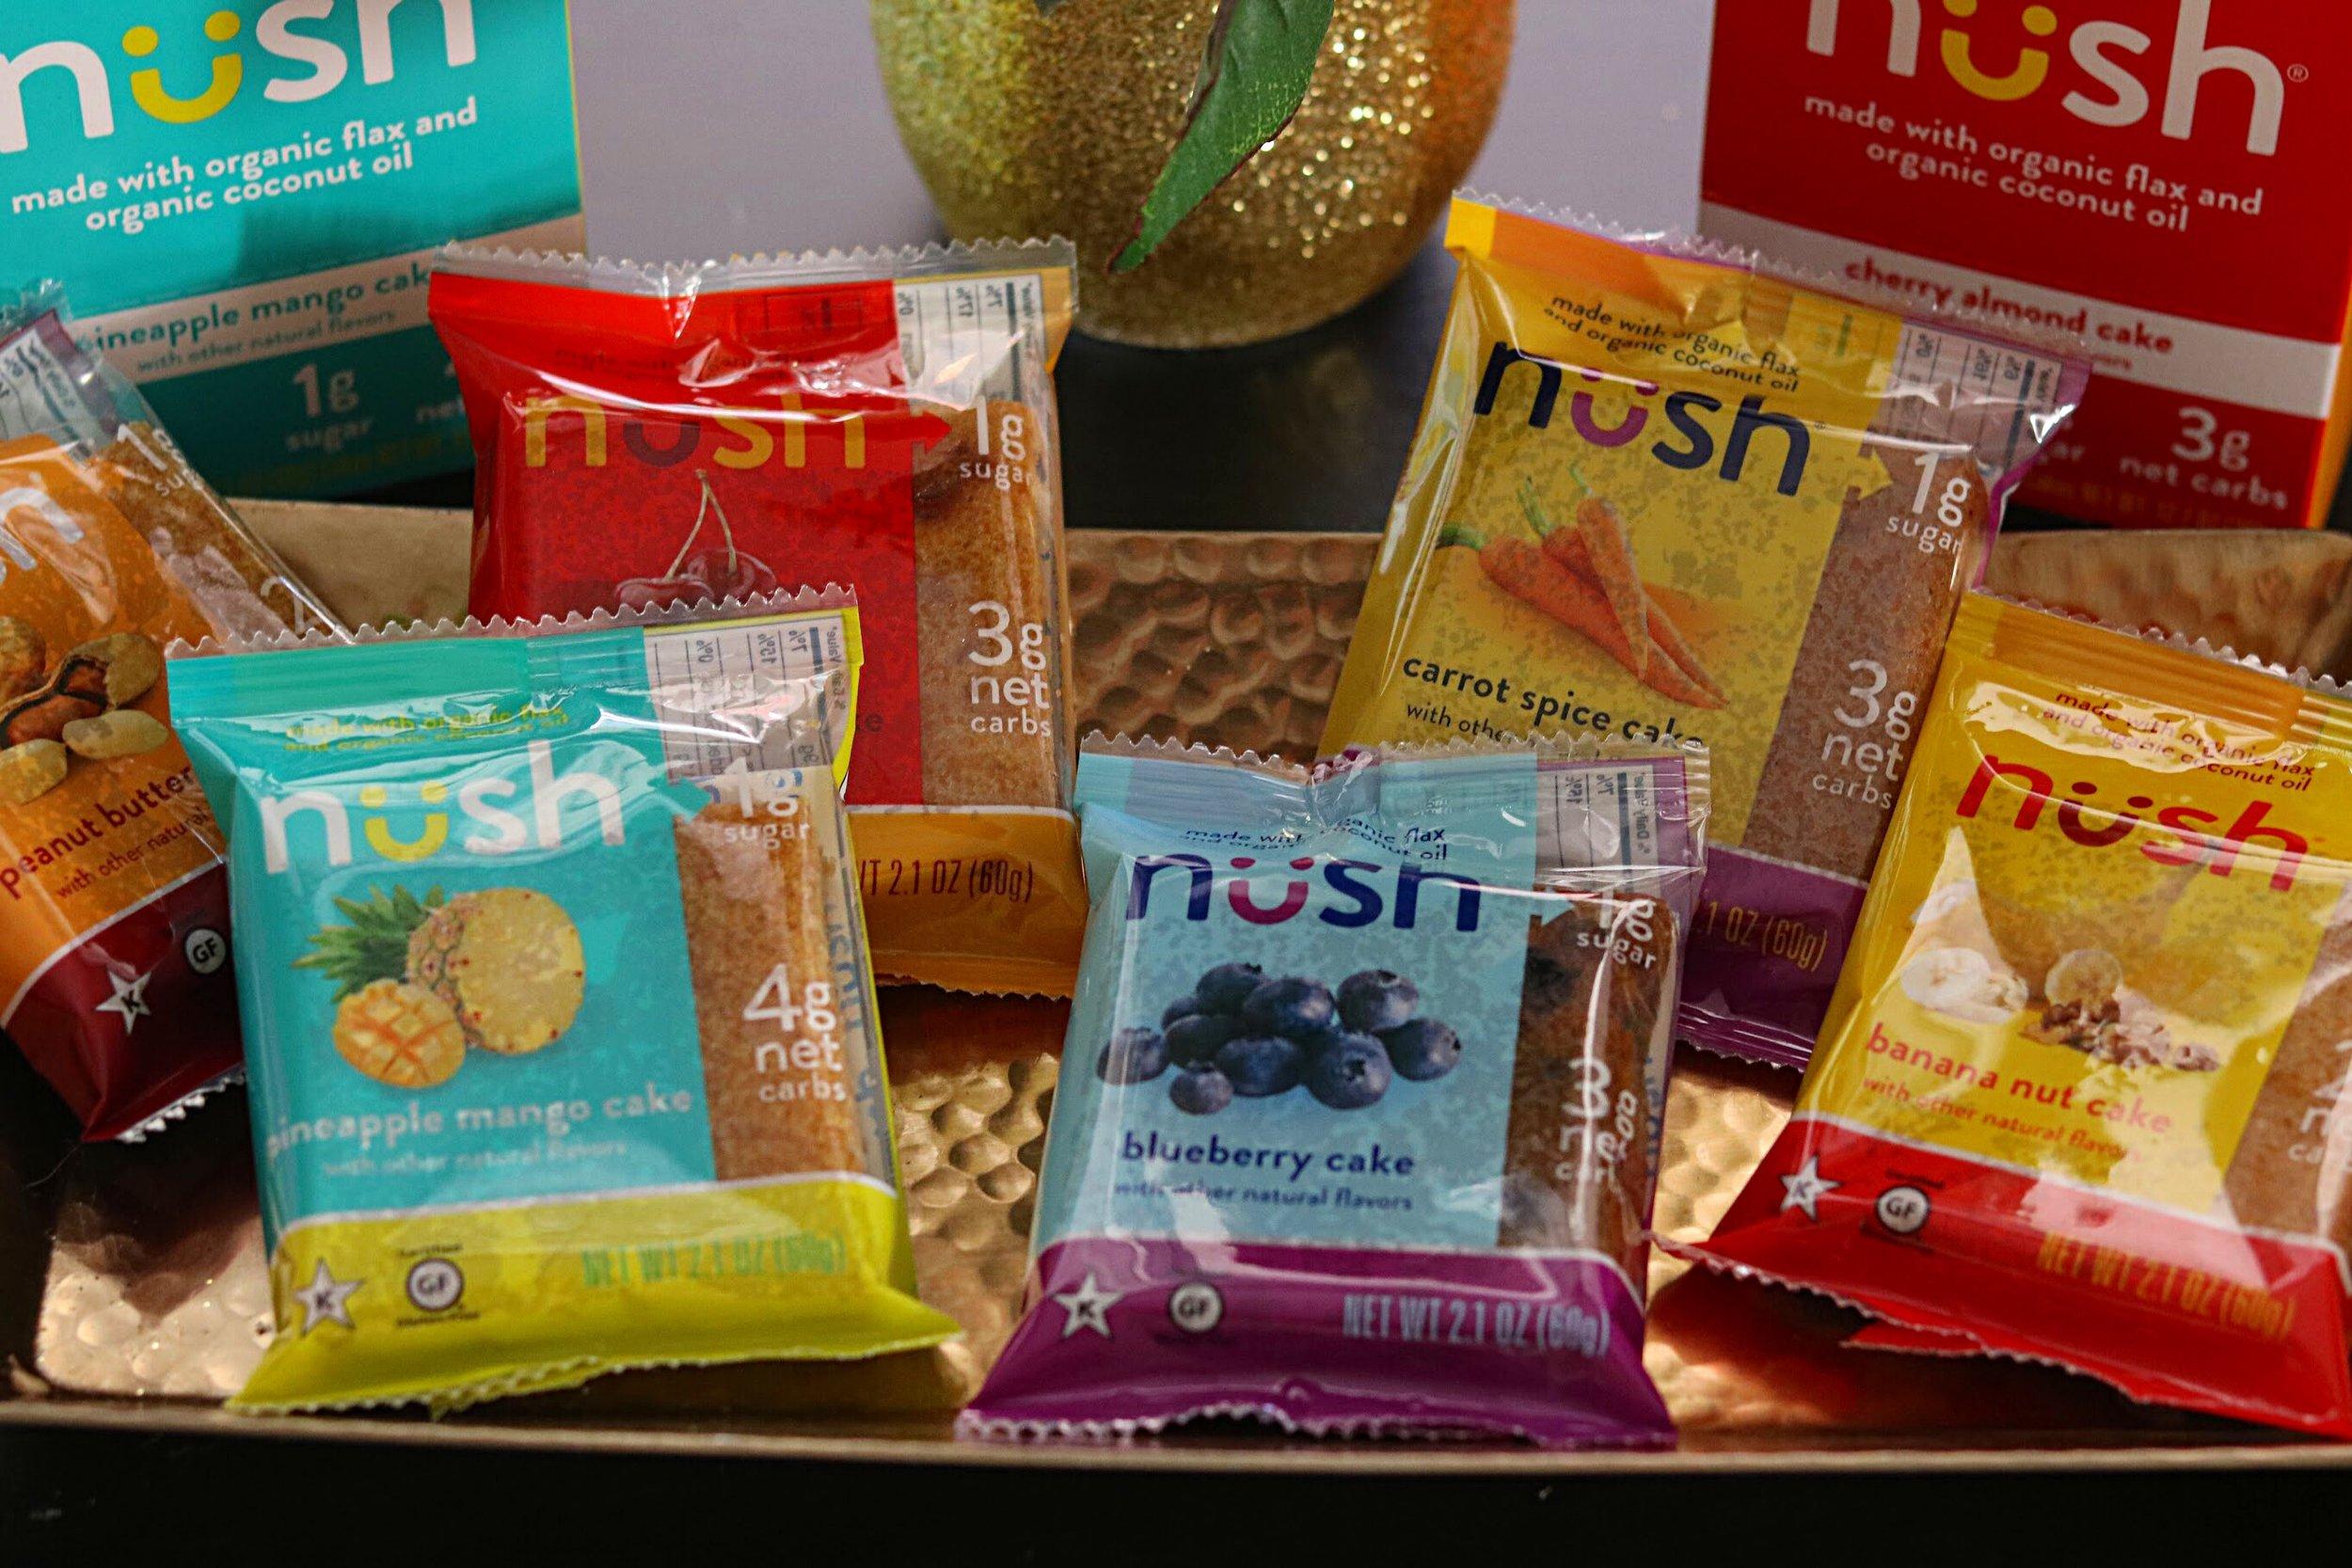 An assortment of Nush Cakes